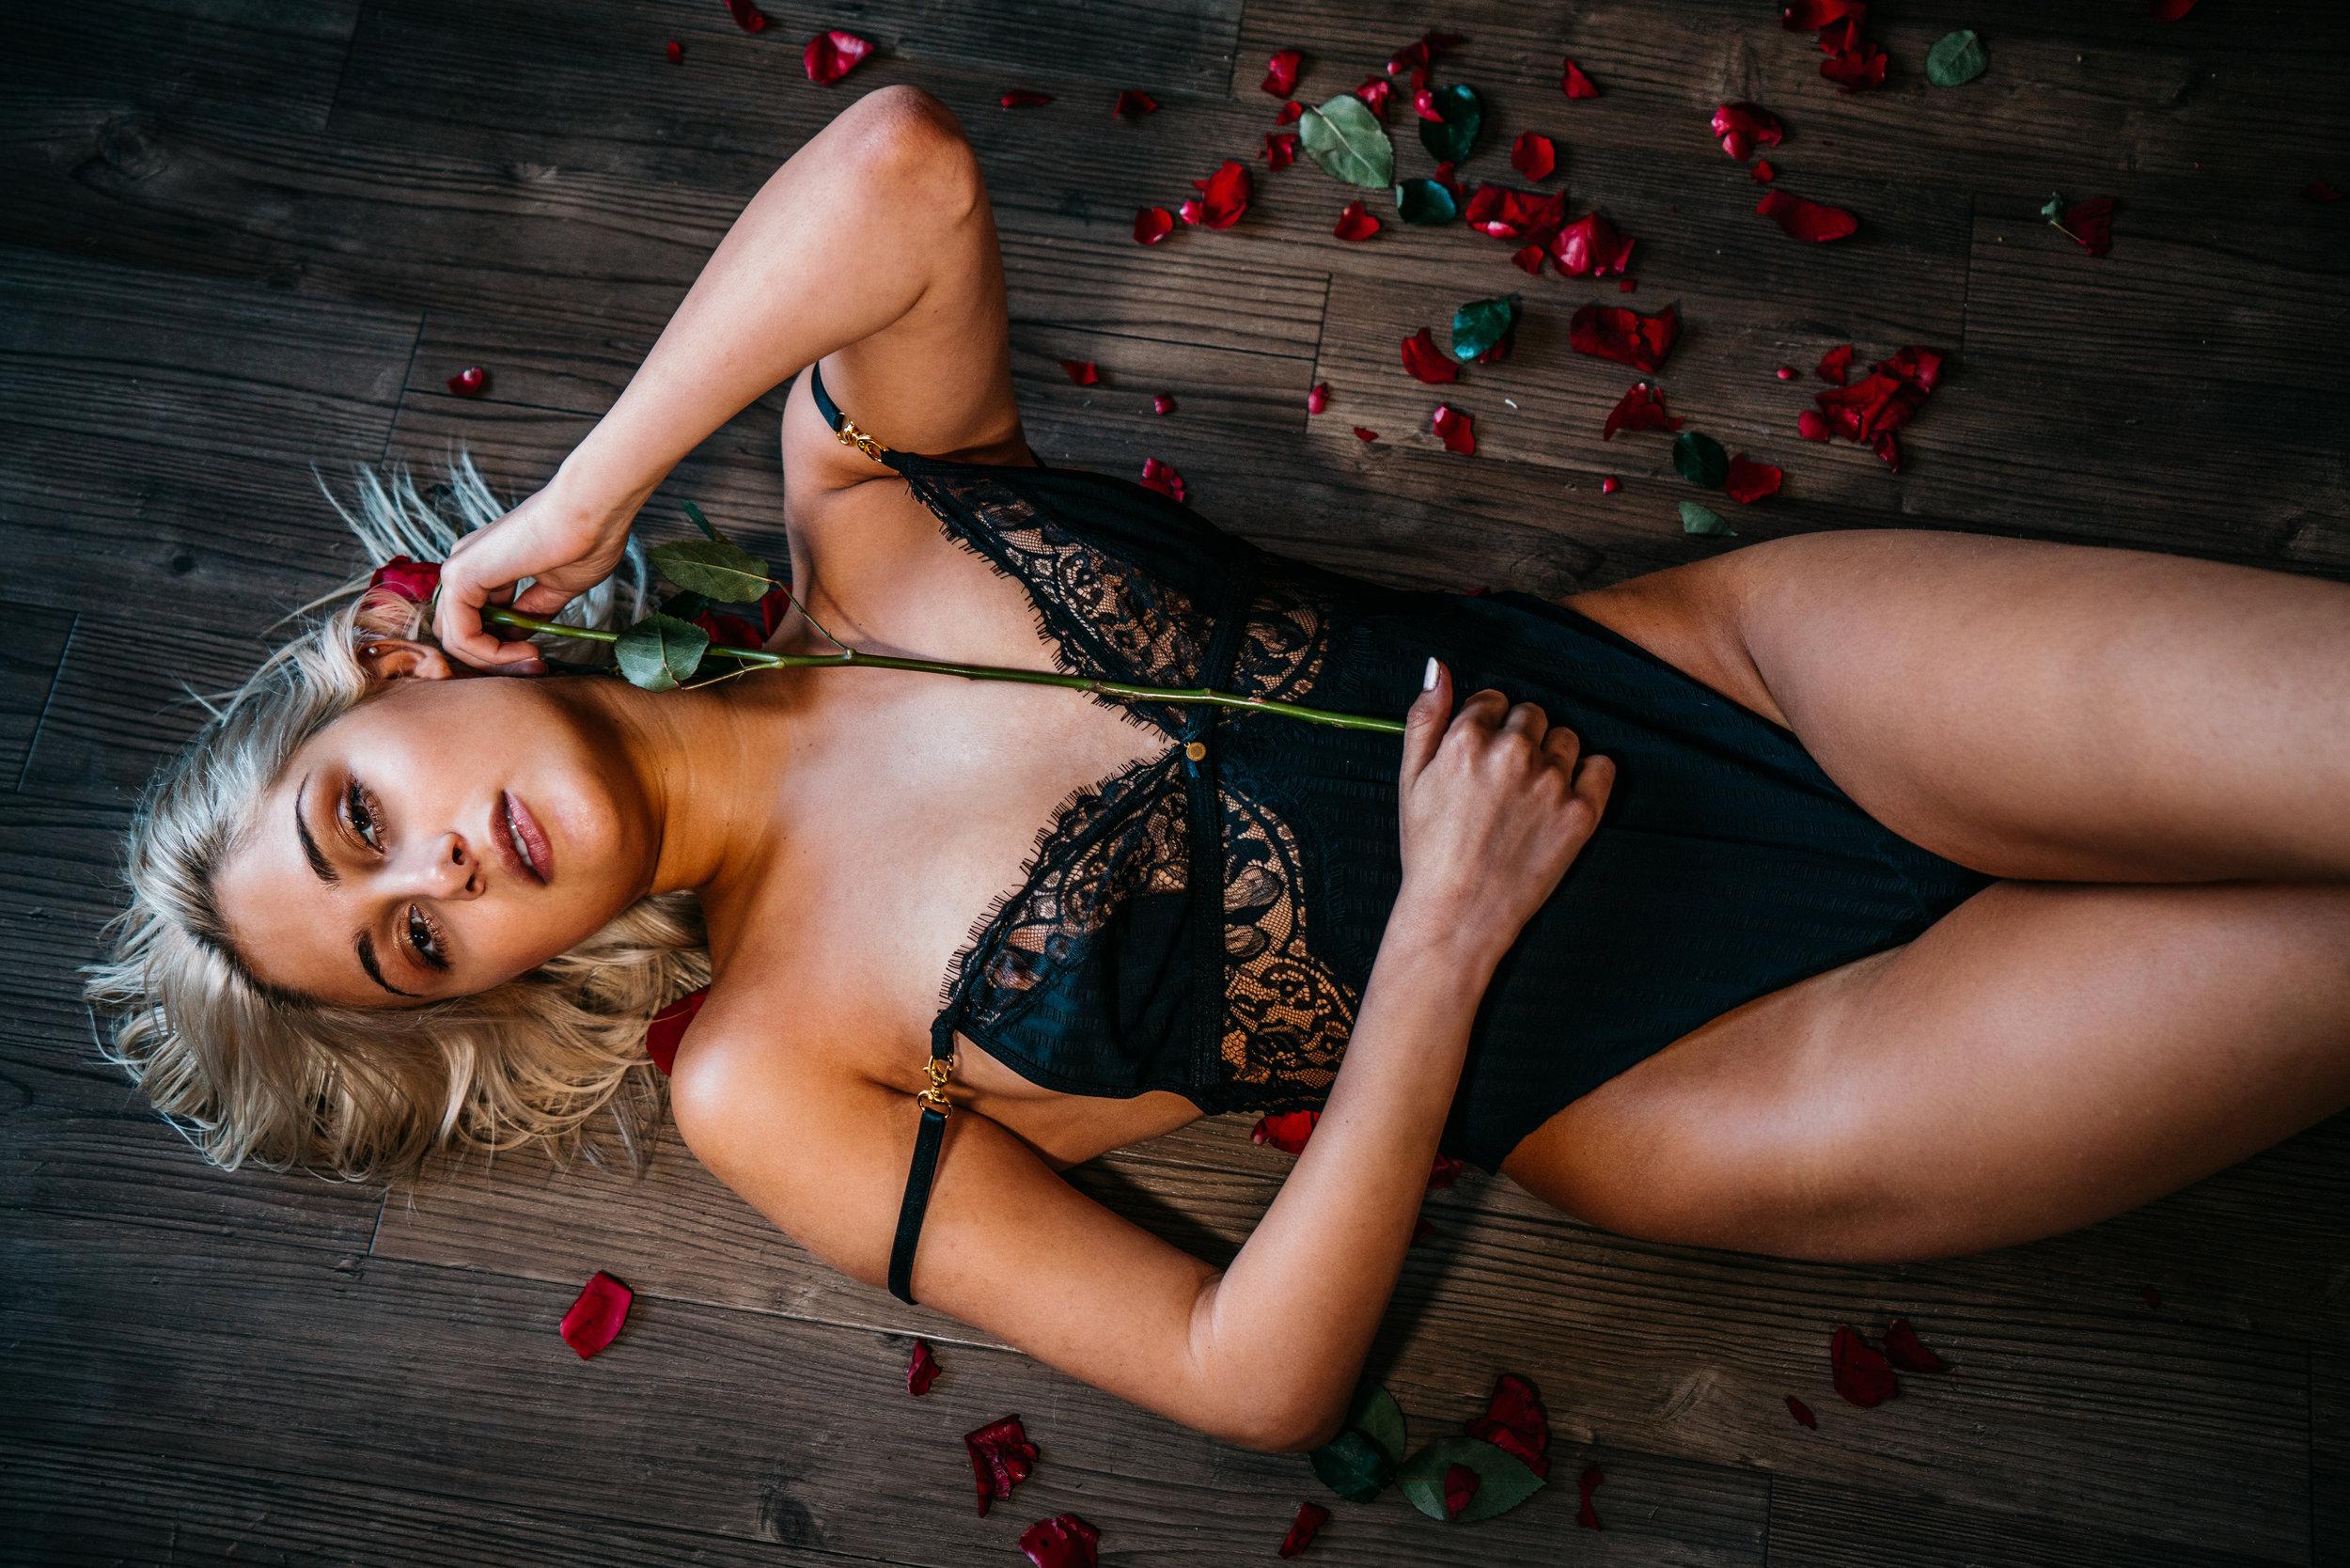 2018.02.09_Angry_Valentine_Hannah_Ridgeway_lowres-9.jpg